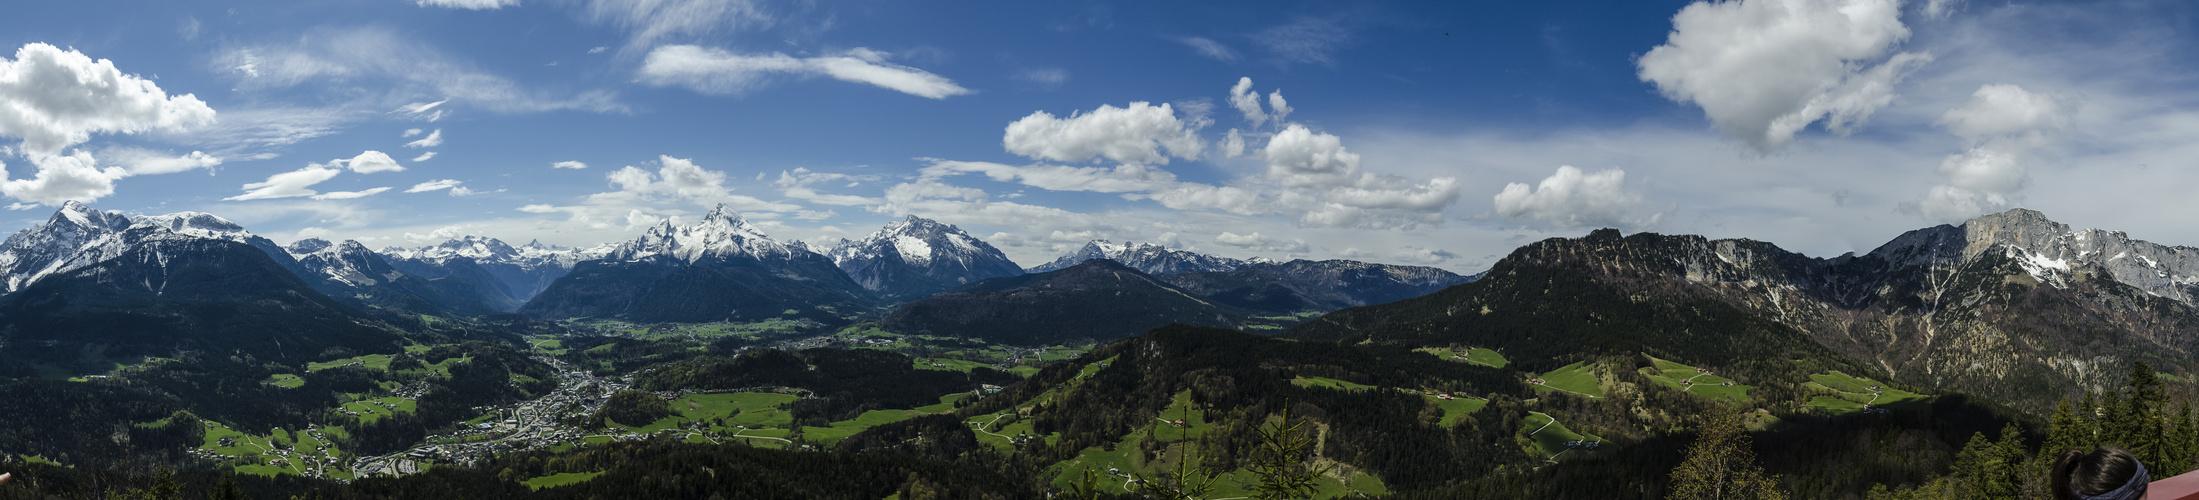 Kneifelspitze Panorama